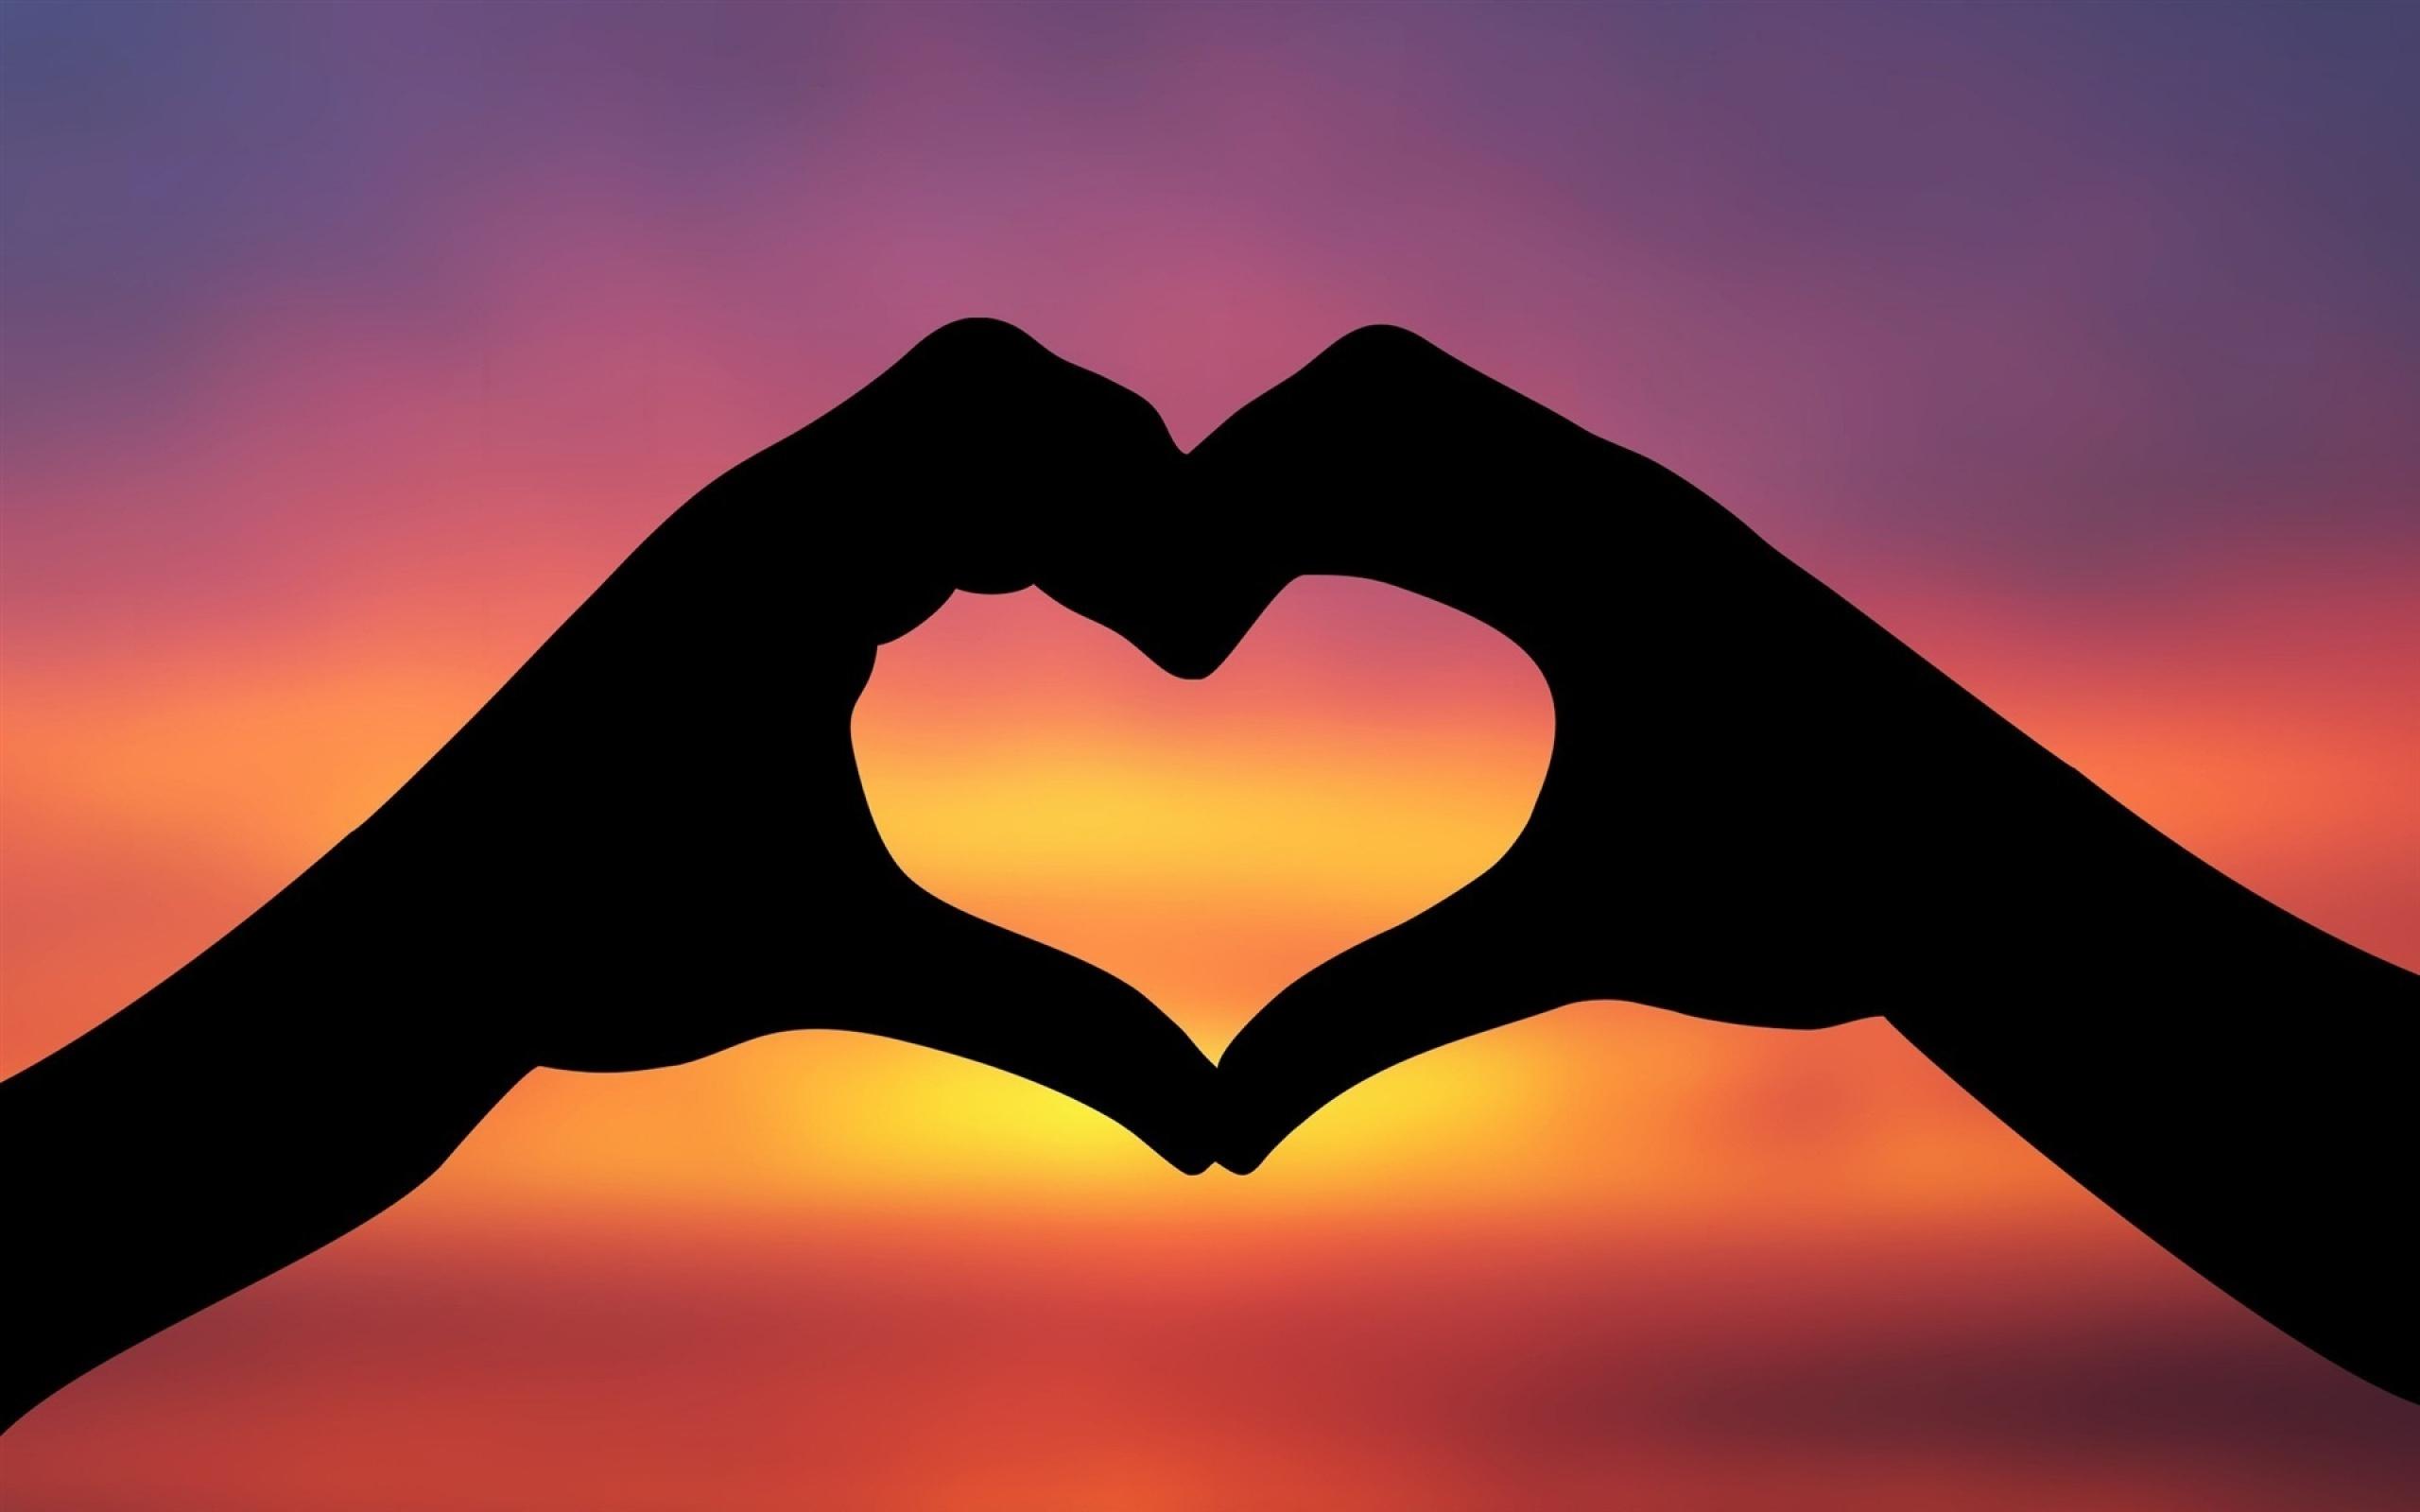 Love Hd Wallpaper Background Image 2560x1600 Id 335608